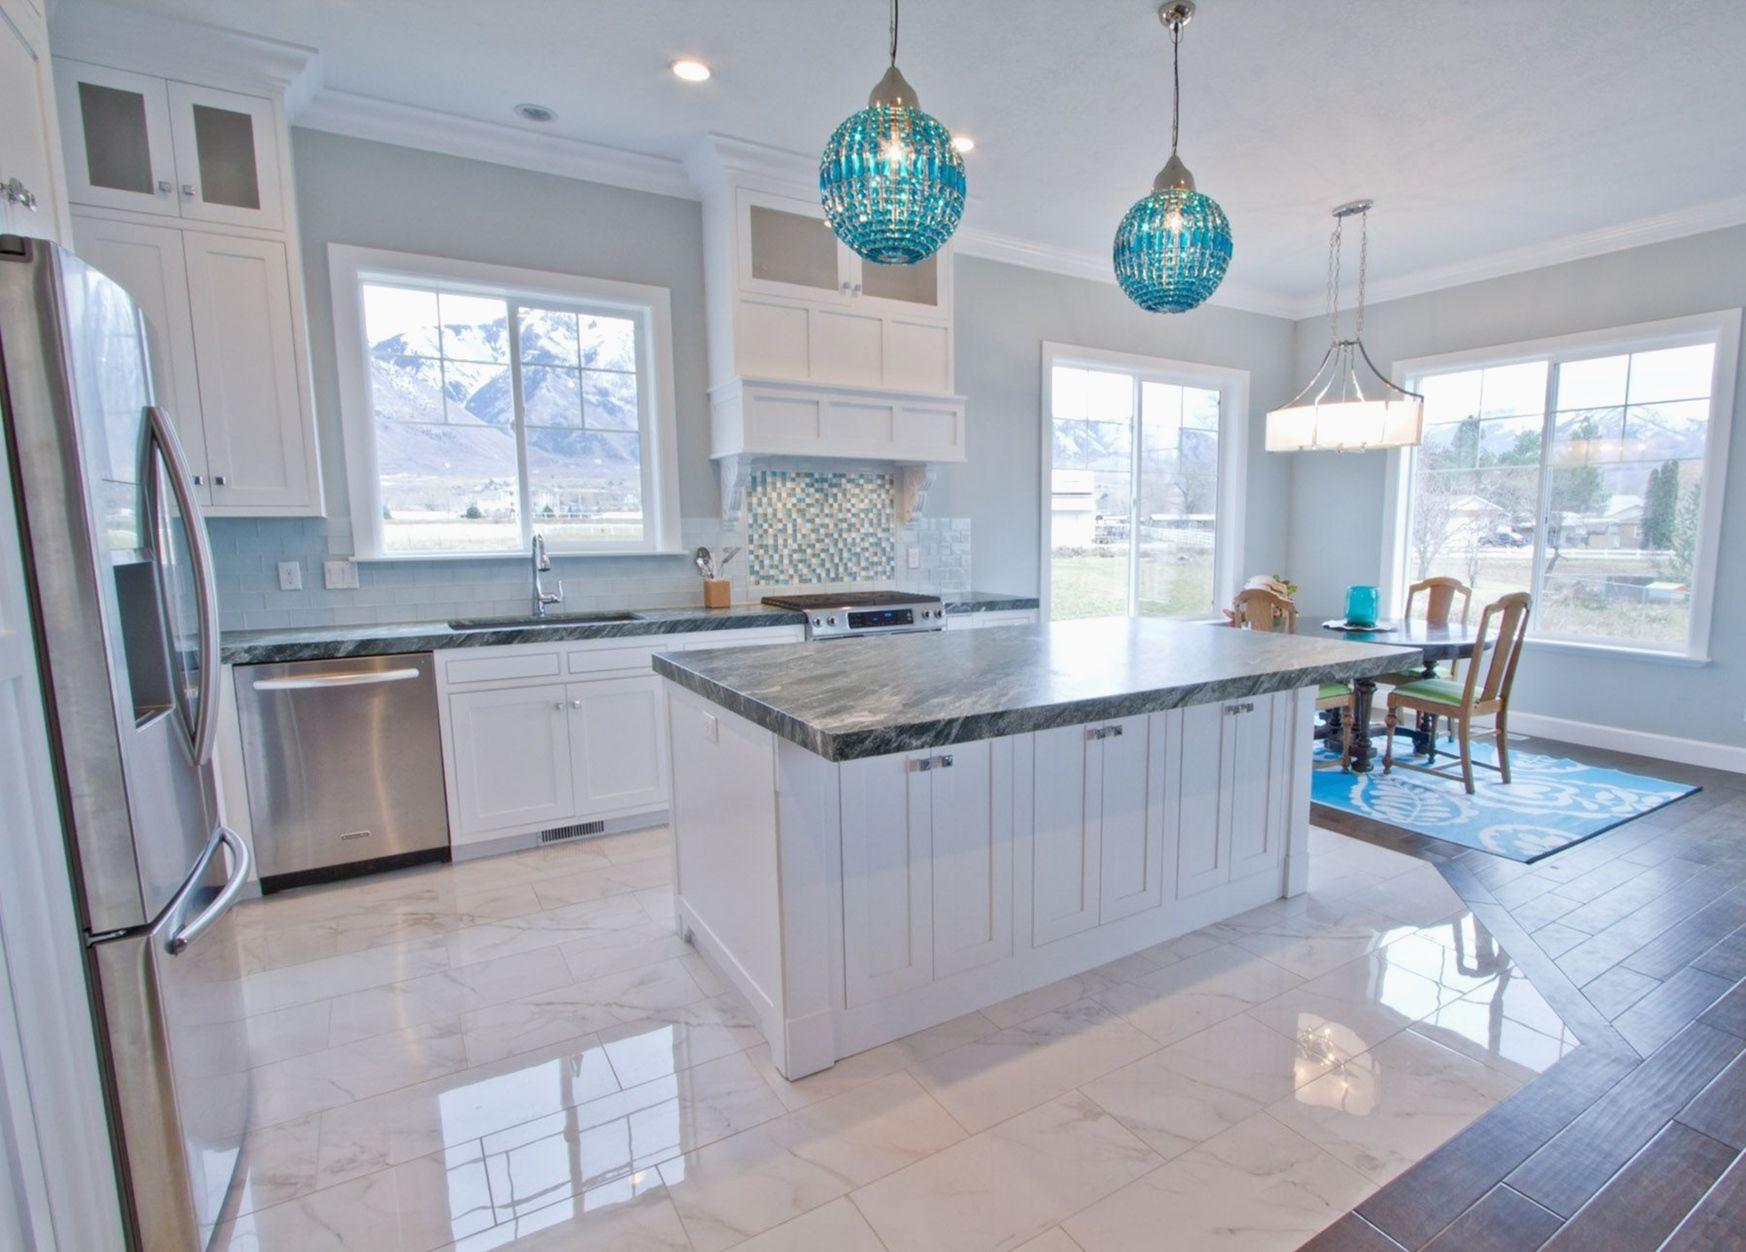 kitchen remodeling queens ny | home ideas | kitchen design, kitchen